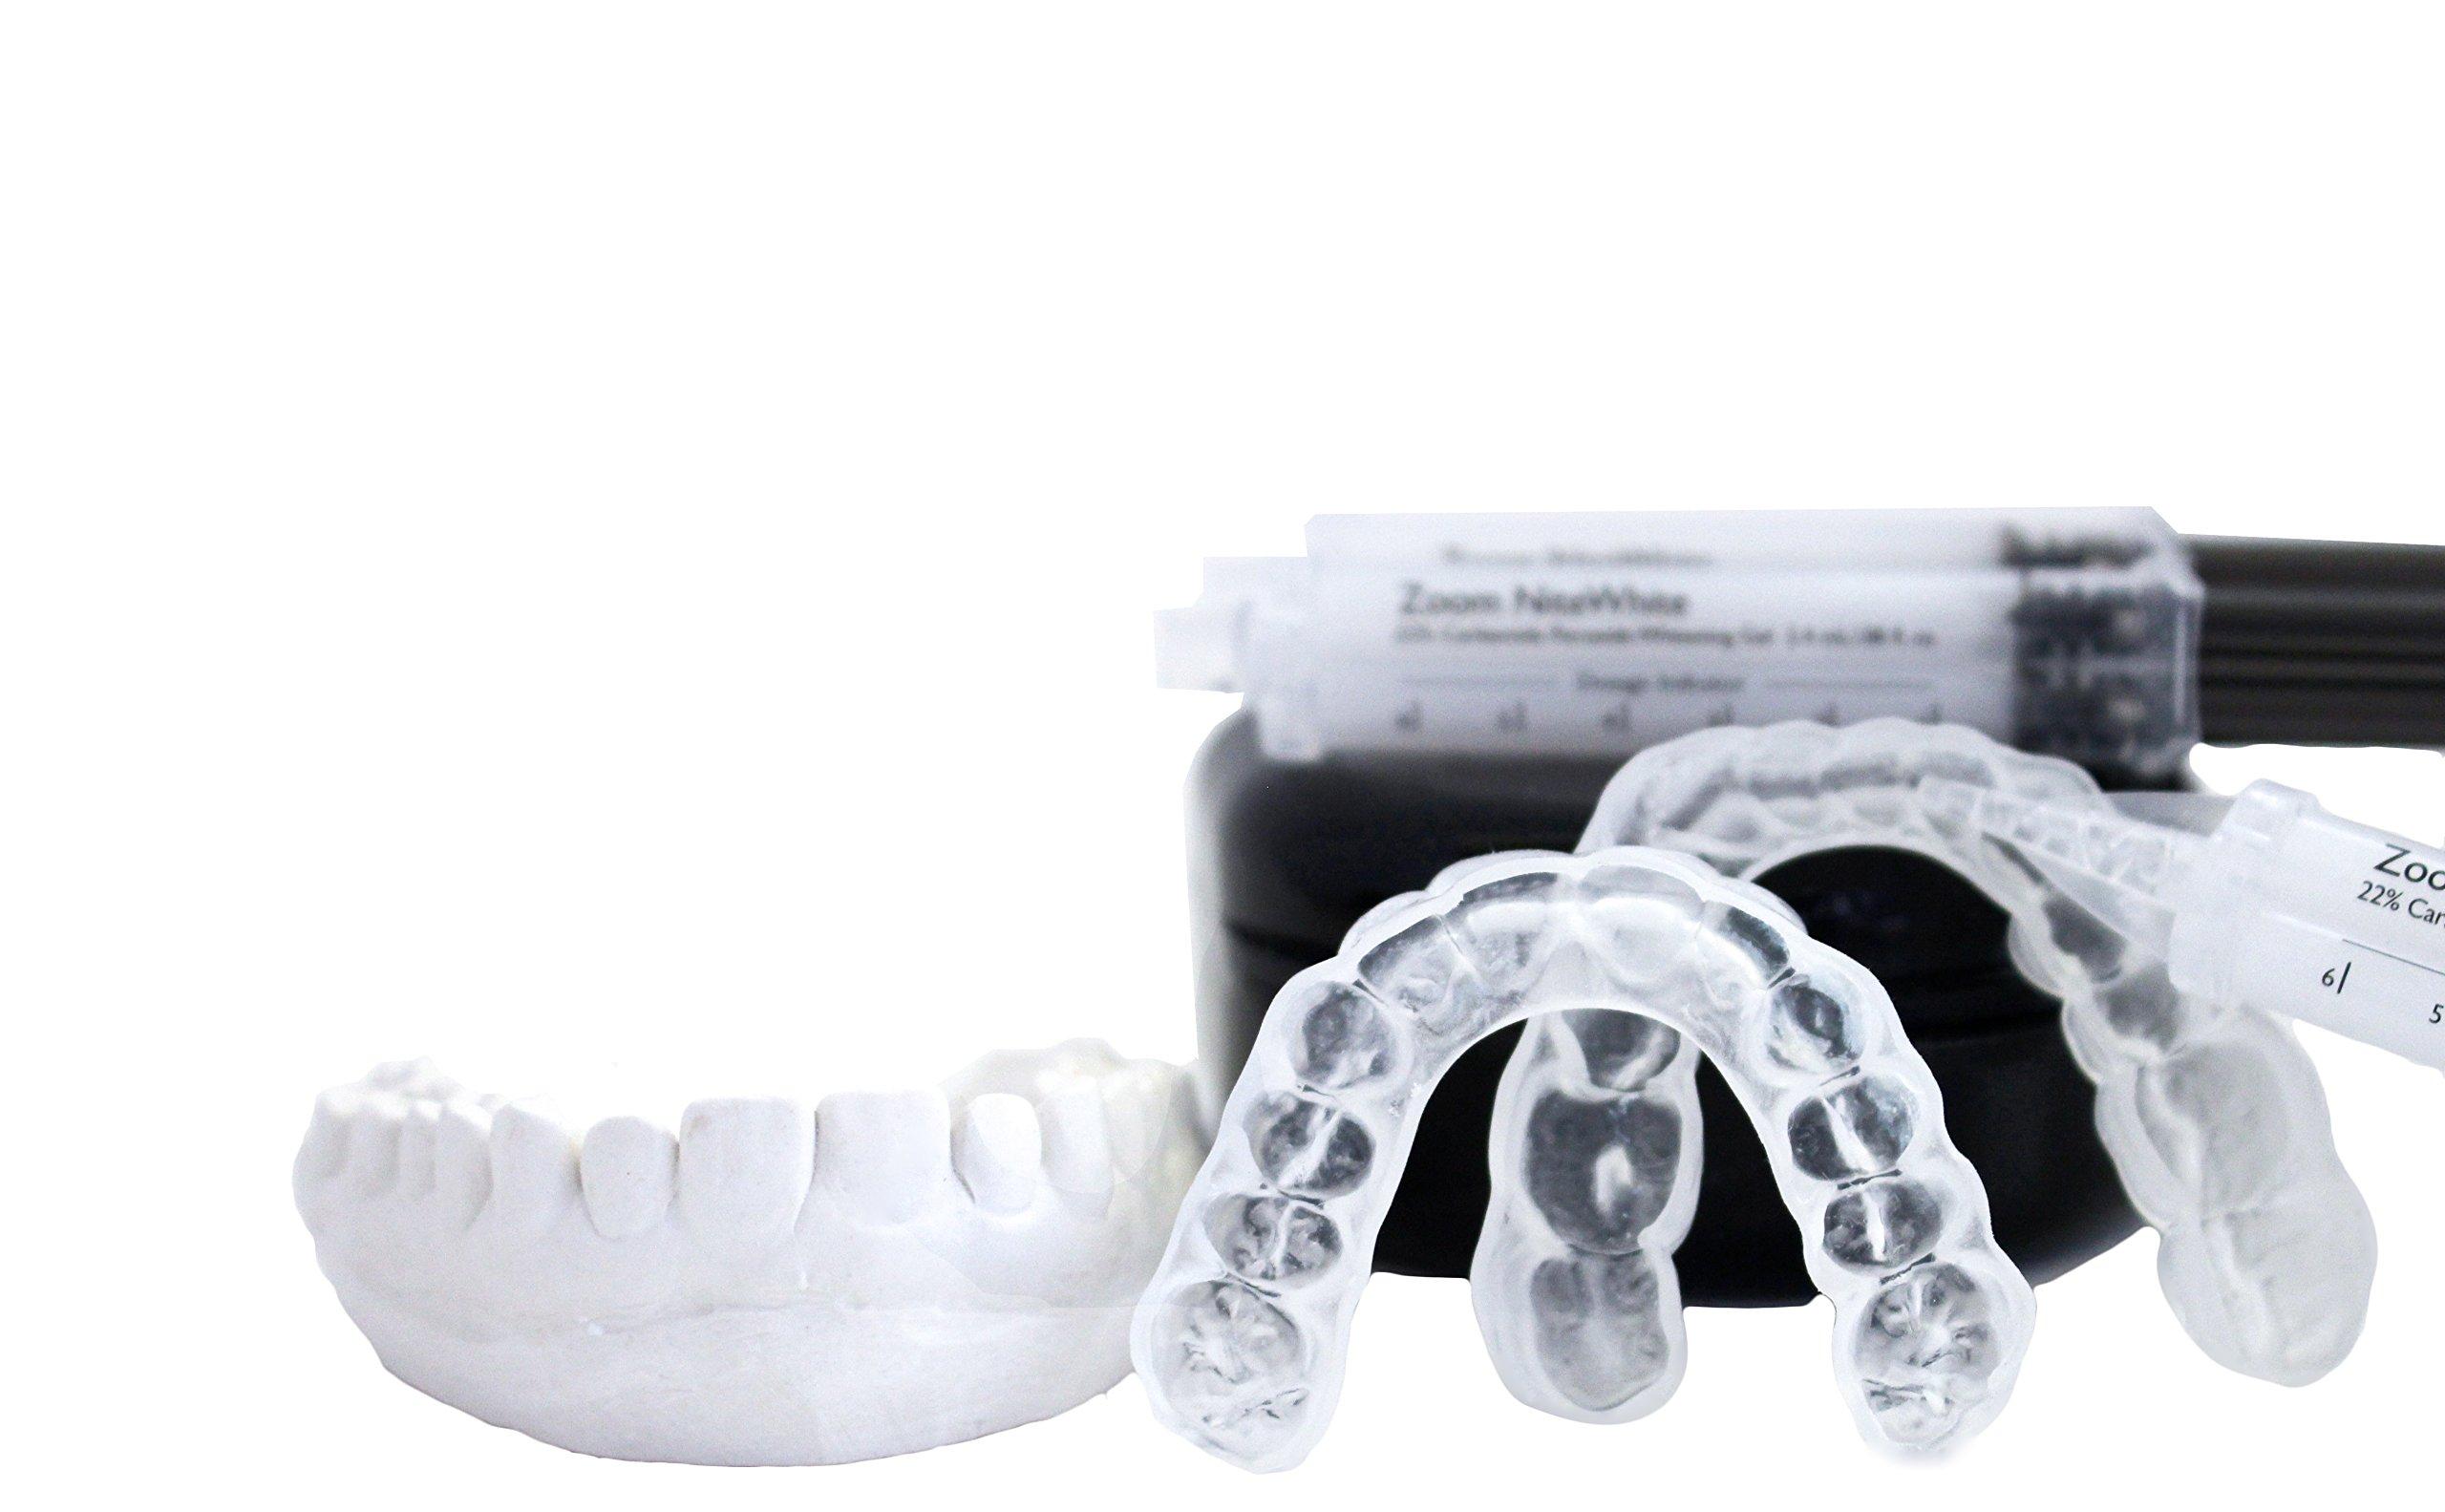 Sentinel Teeth Whitening System Professional Custom Made Thin Dental Trays Just Like the Dentist! Plus Zoom! 22% Whitening Gel (Adult Female)